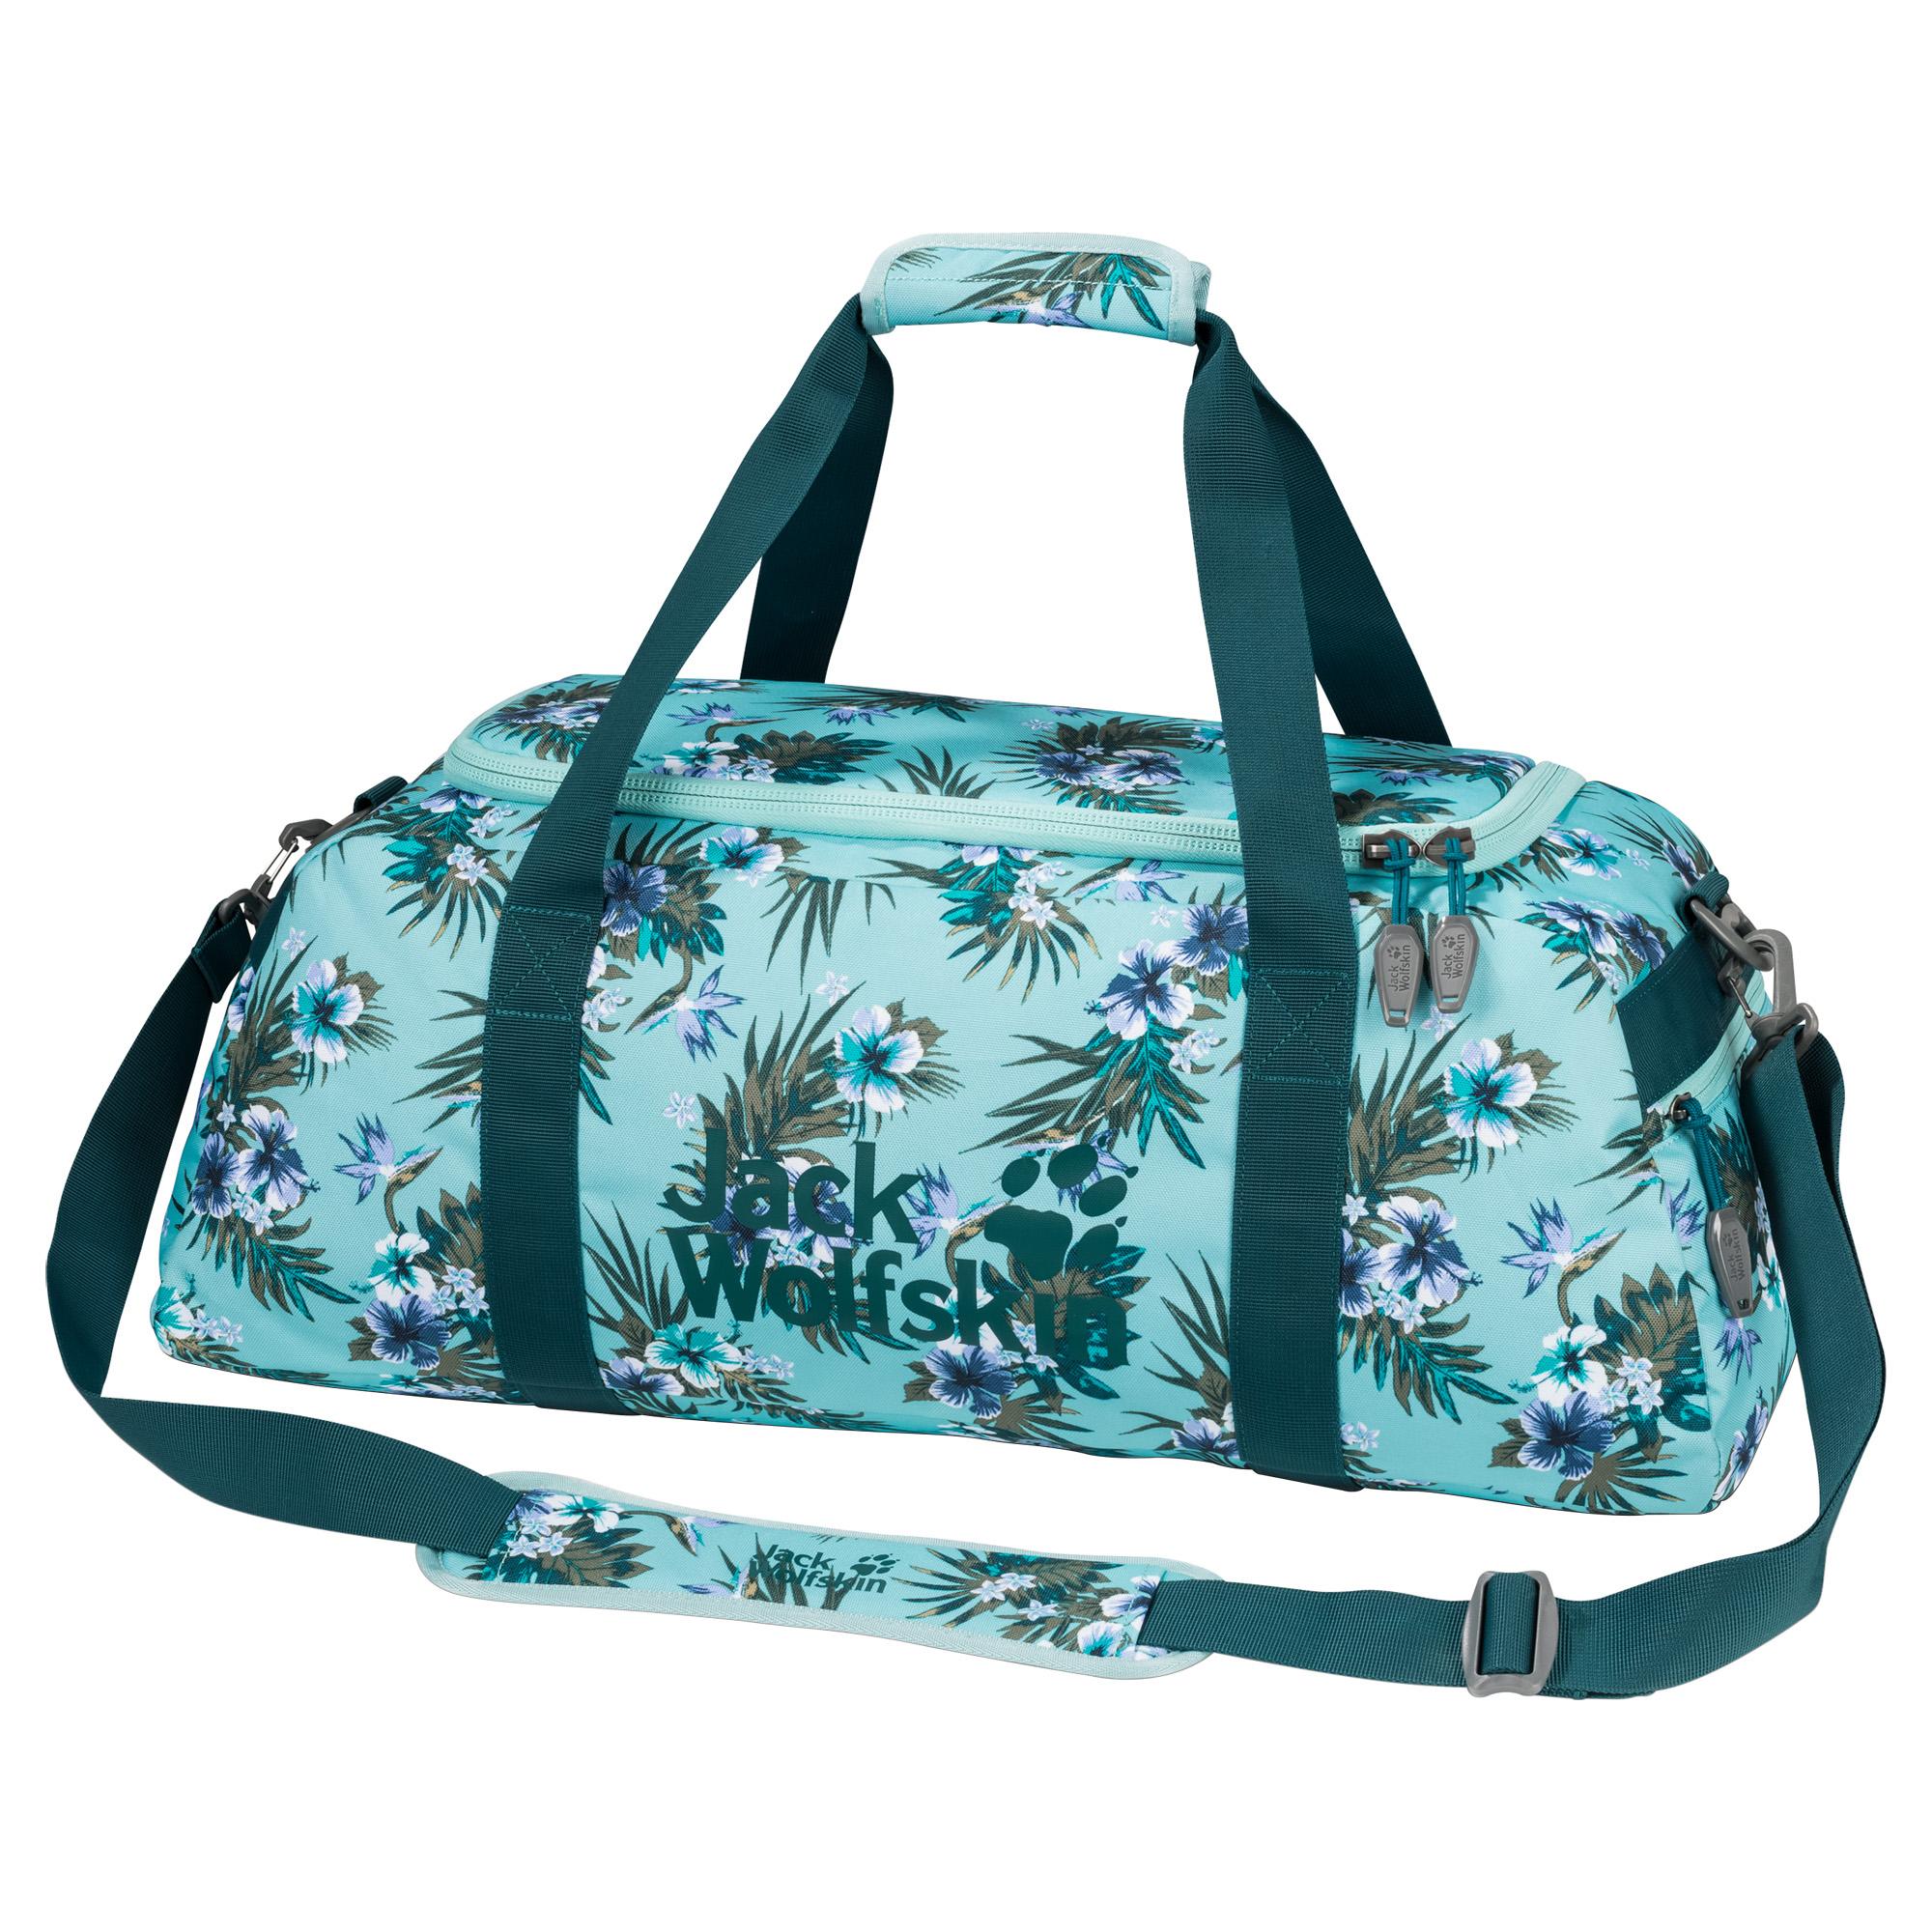 jack-wolfskin-action-bag-35-sporttasche-farbe-8019-tropical-blue-